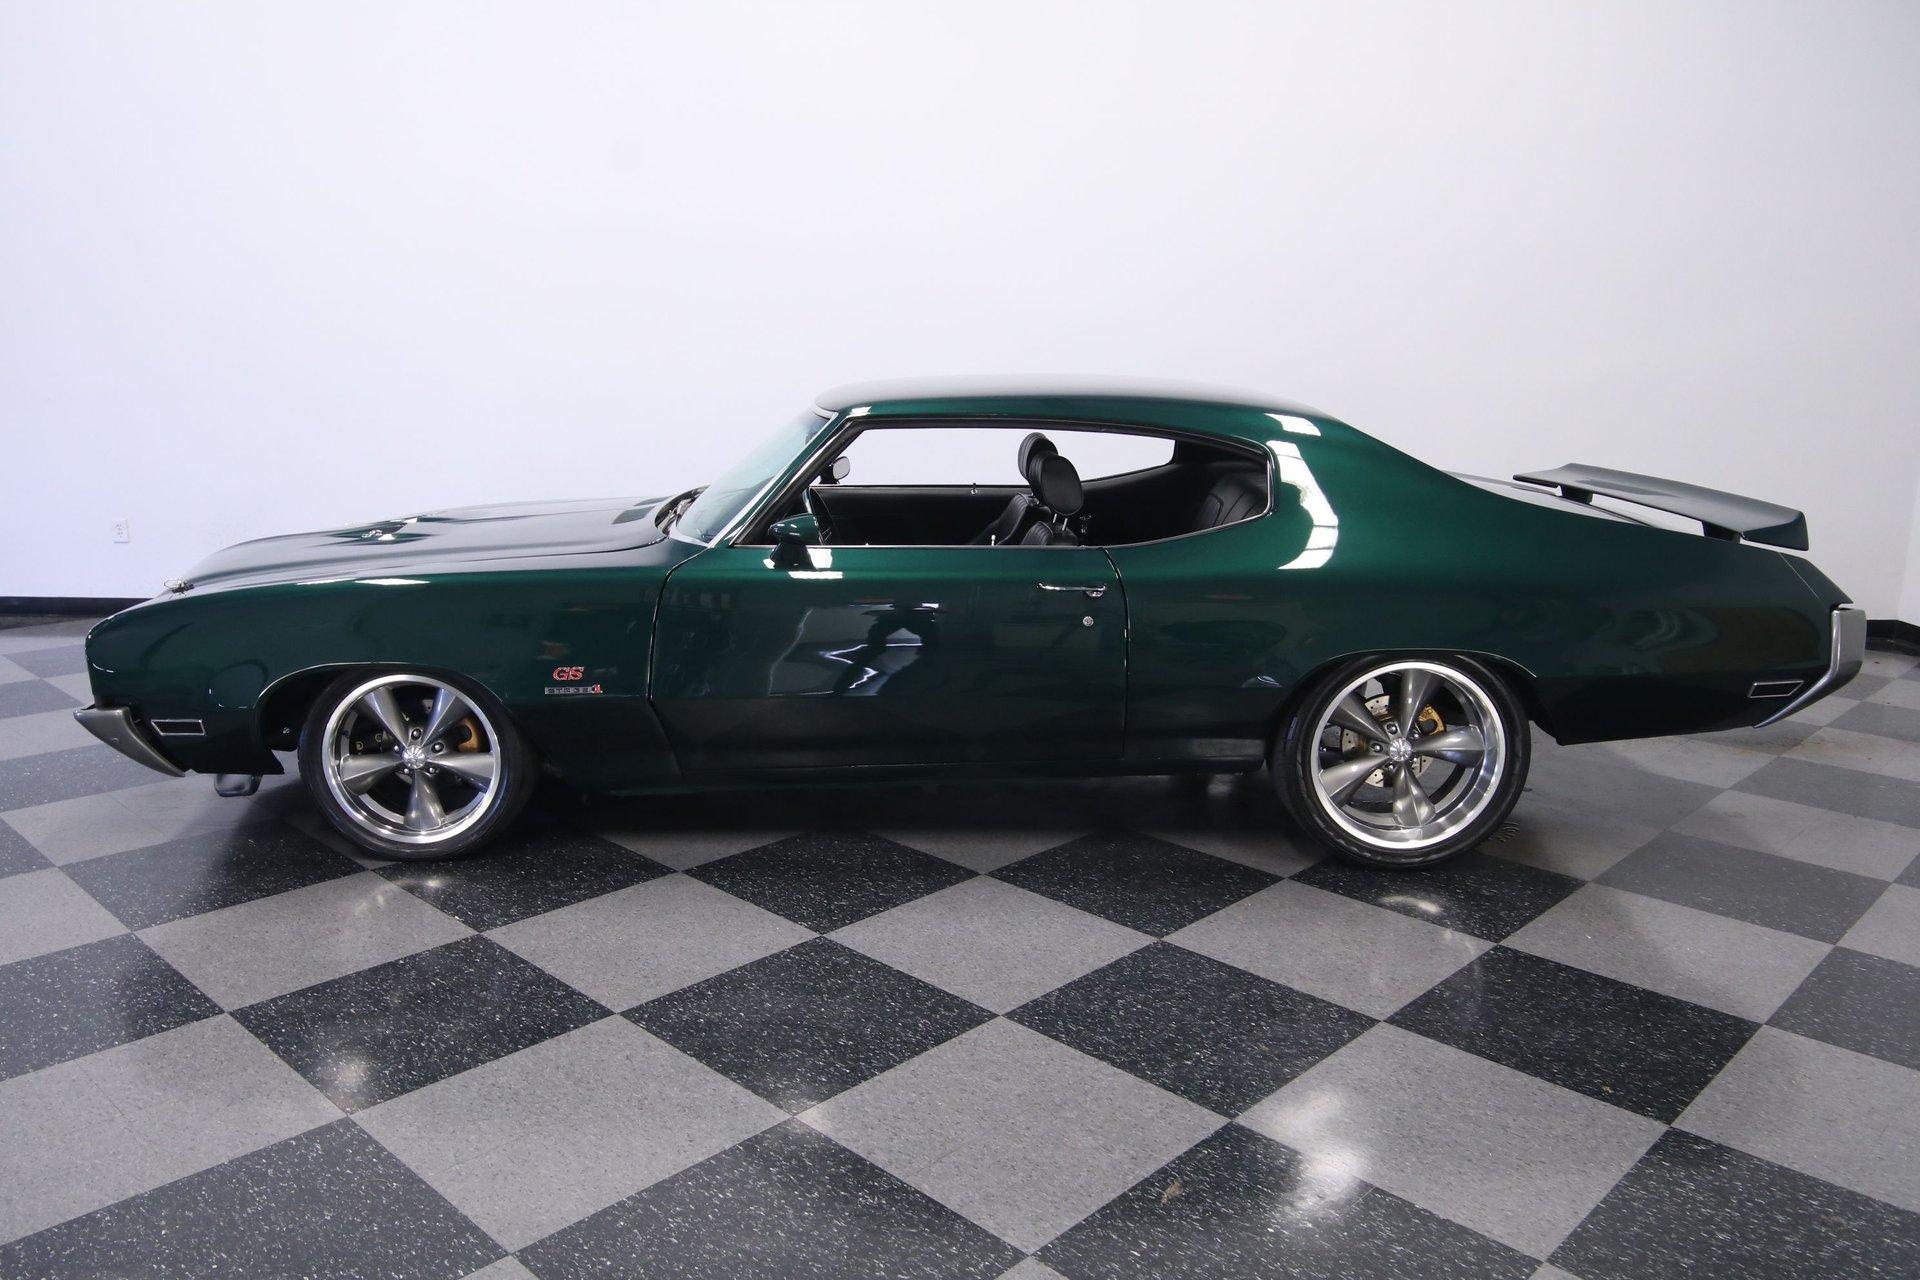 1970 buick gs 455 restomod